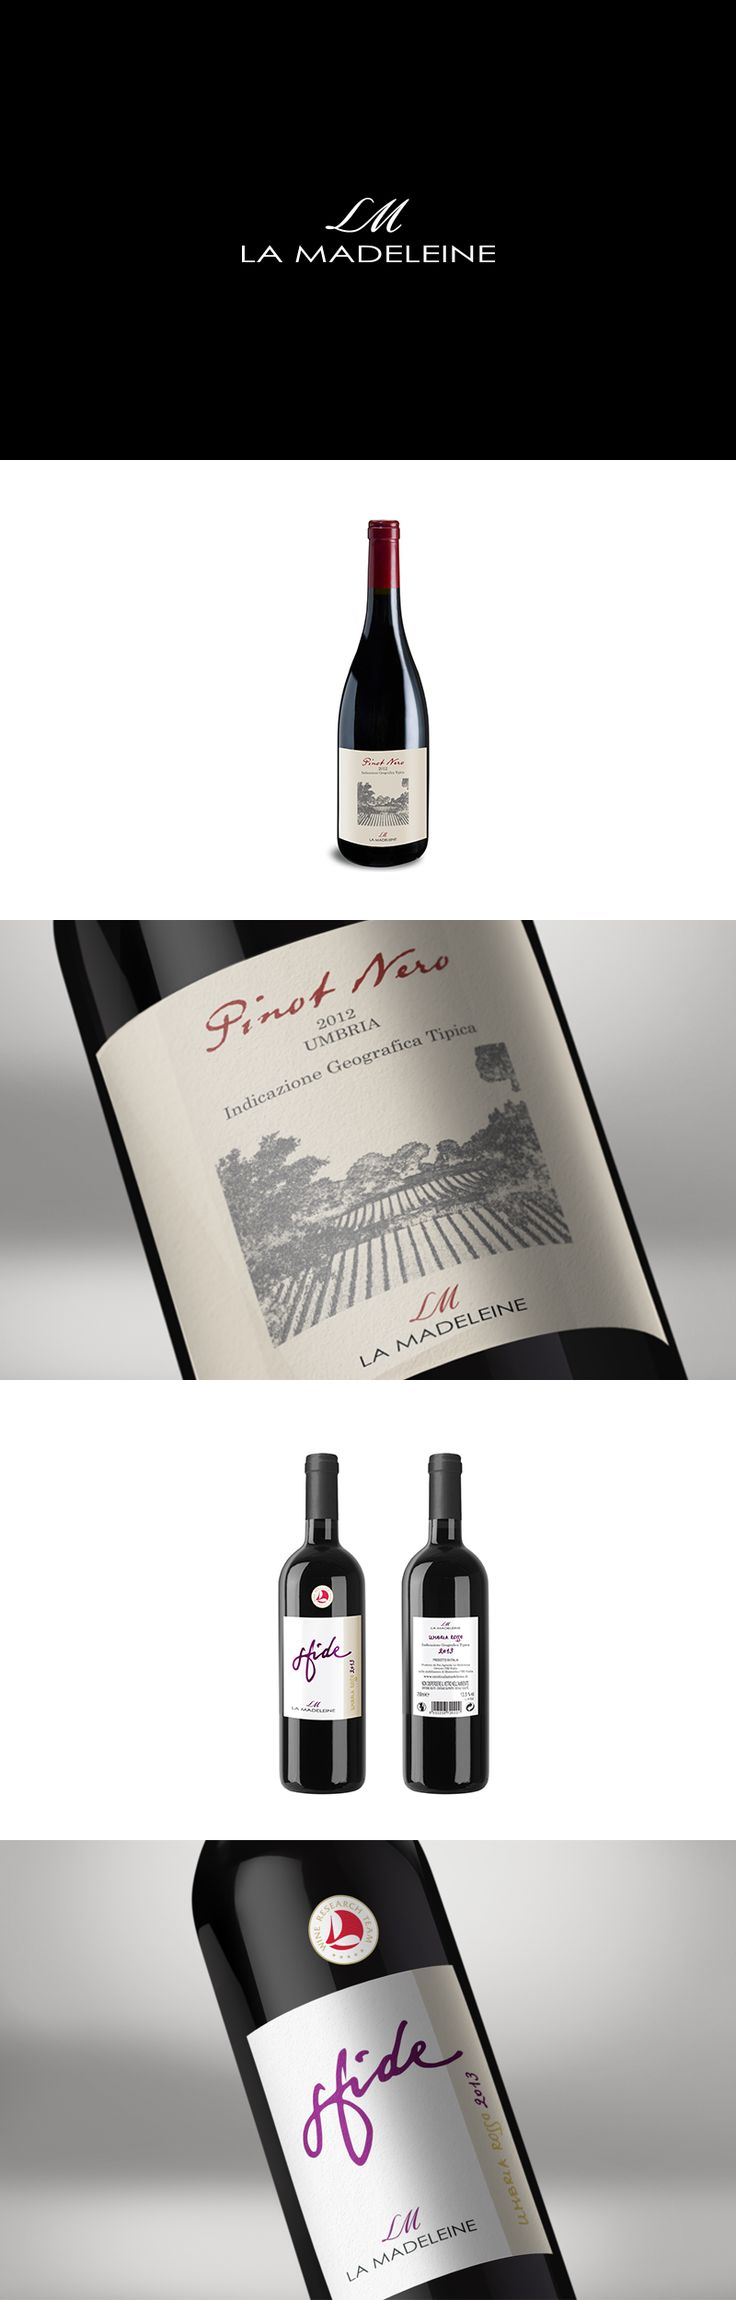 La Madaleine, Label Design ─ Giulio Patrizi Design Agency ©    #wine #label #design #bottle